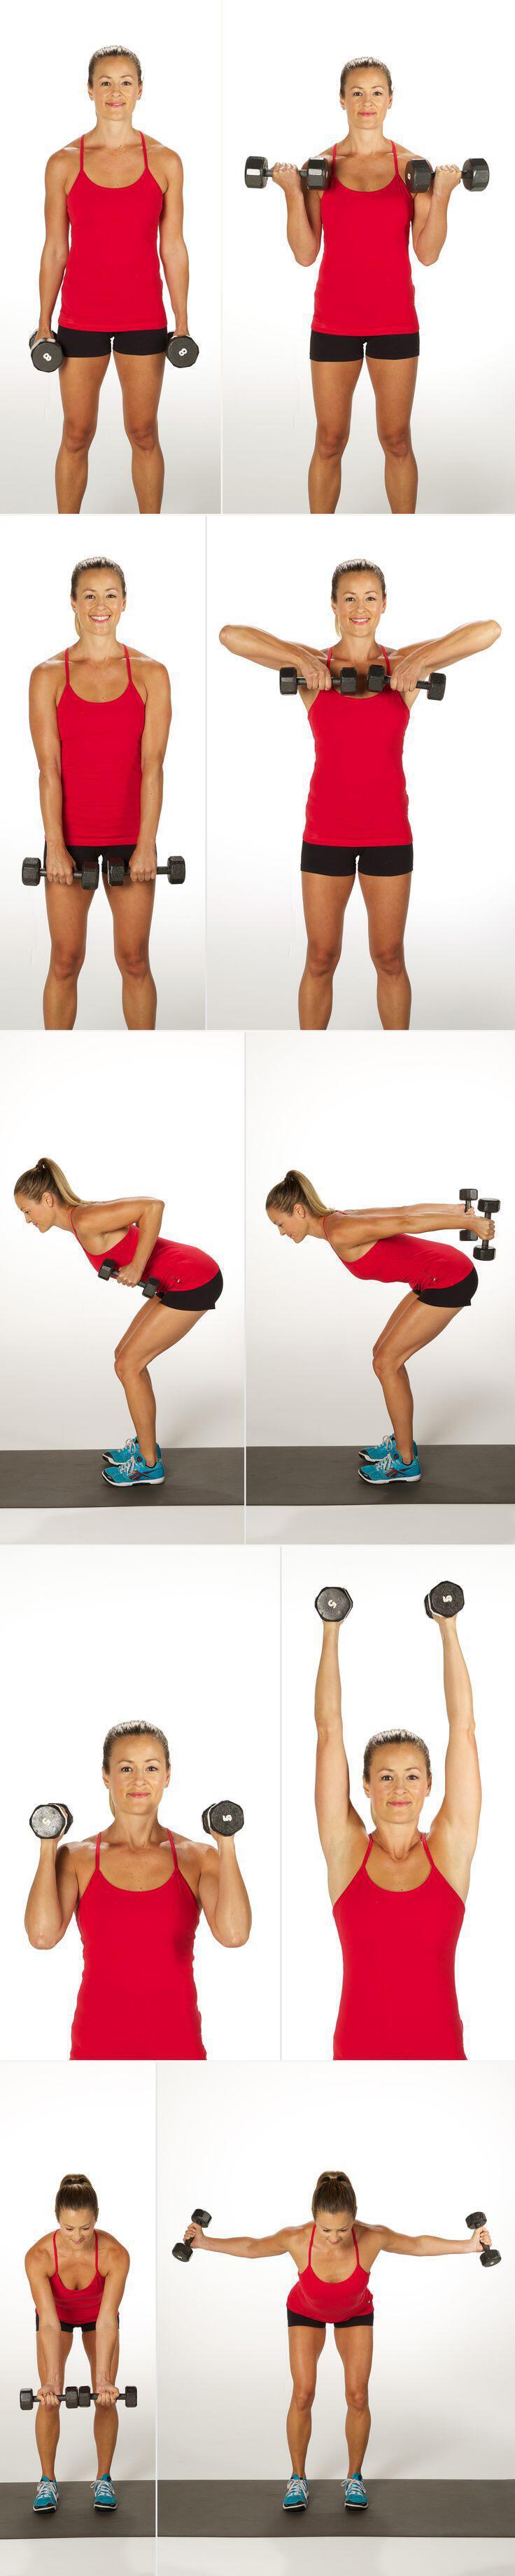 super askisis gia gimnasmeni plati4 - Super ασκήσεις για γυμνασμένη πλάτη